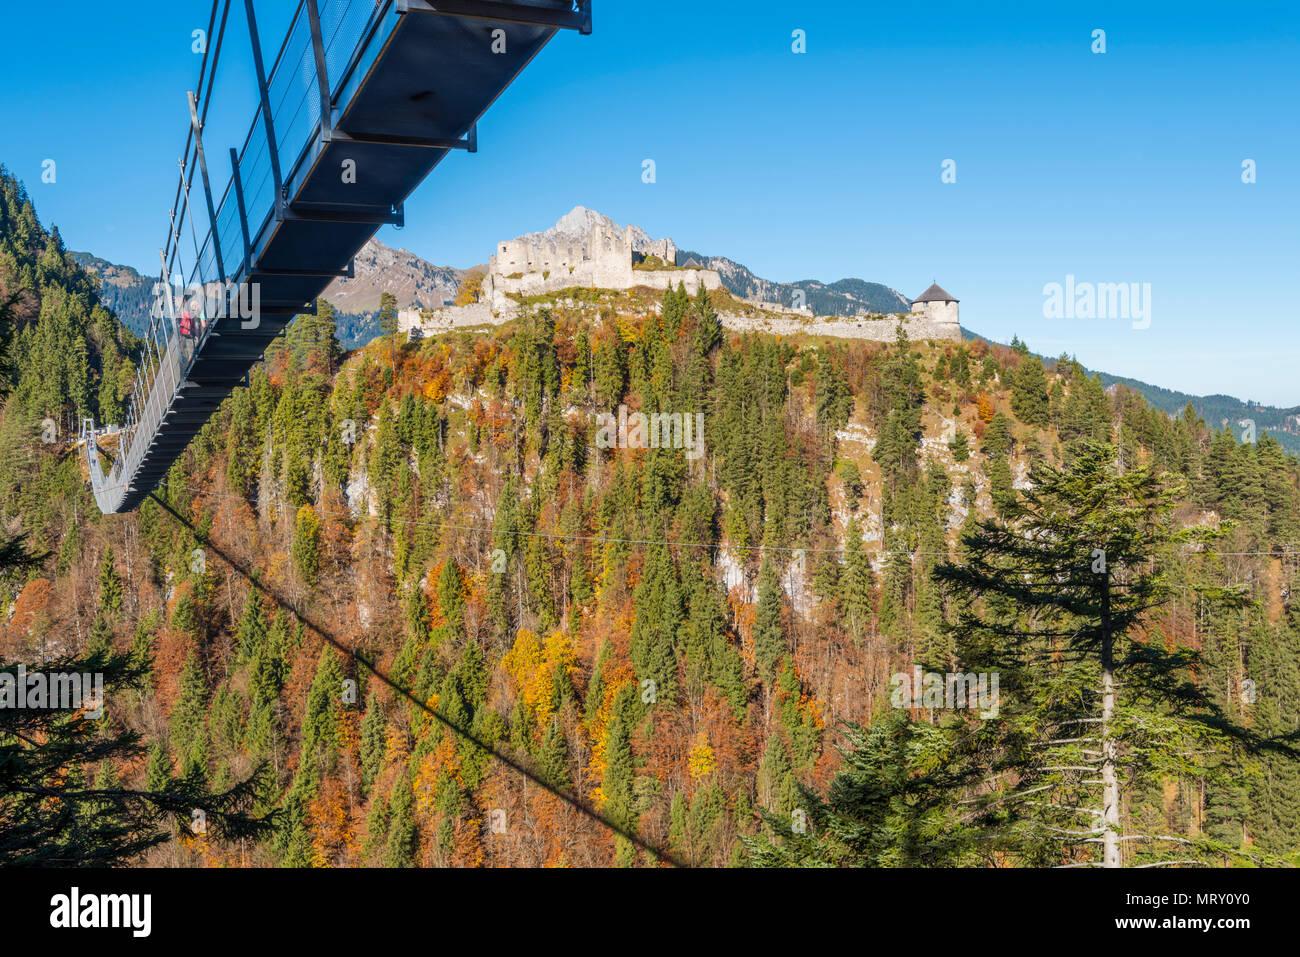 Reutte, Tyrol, Austria, Europe. Ehrenberg Castle and the Highline ...